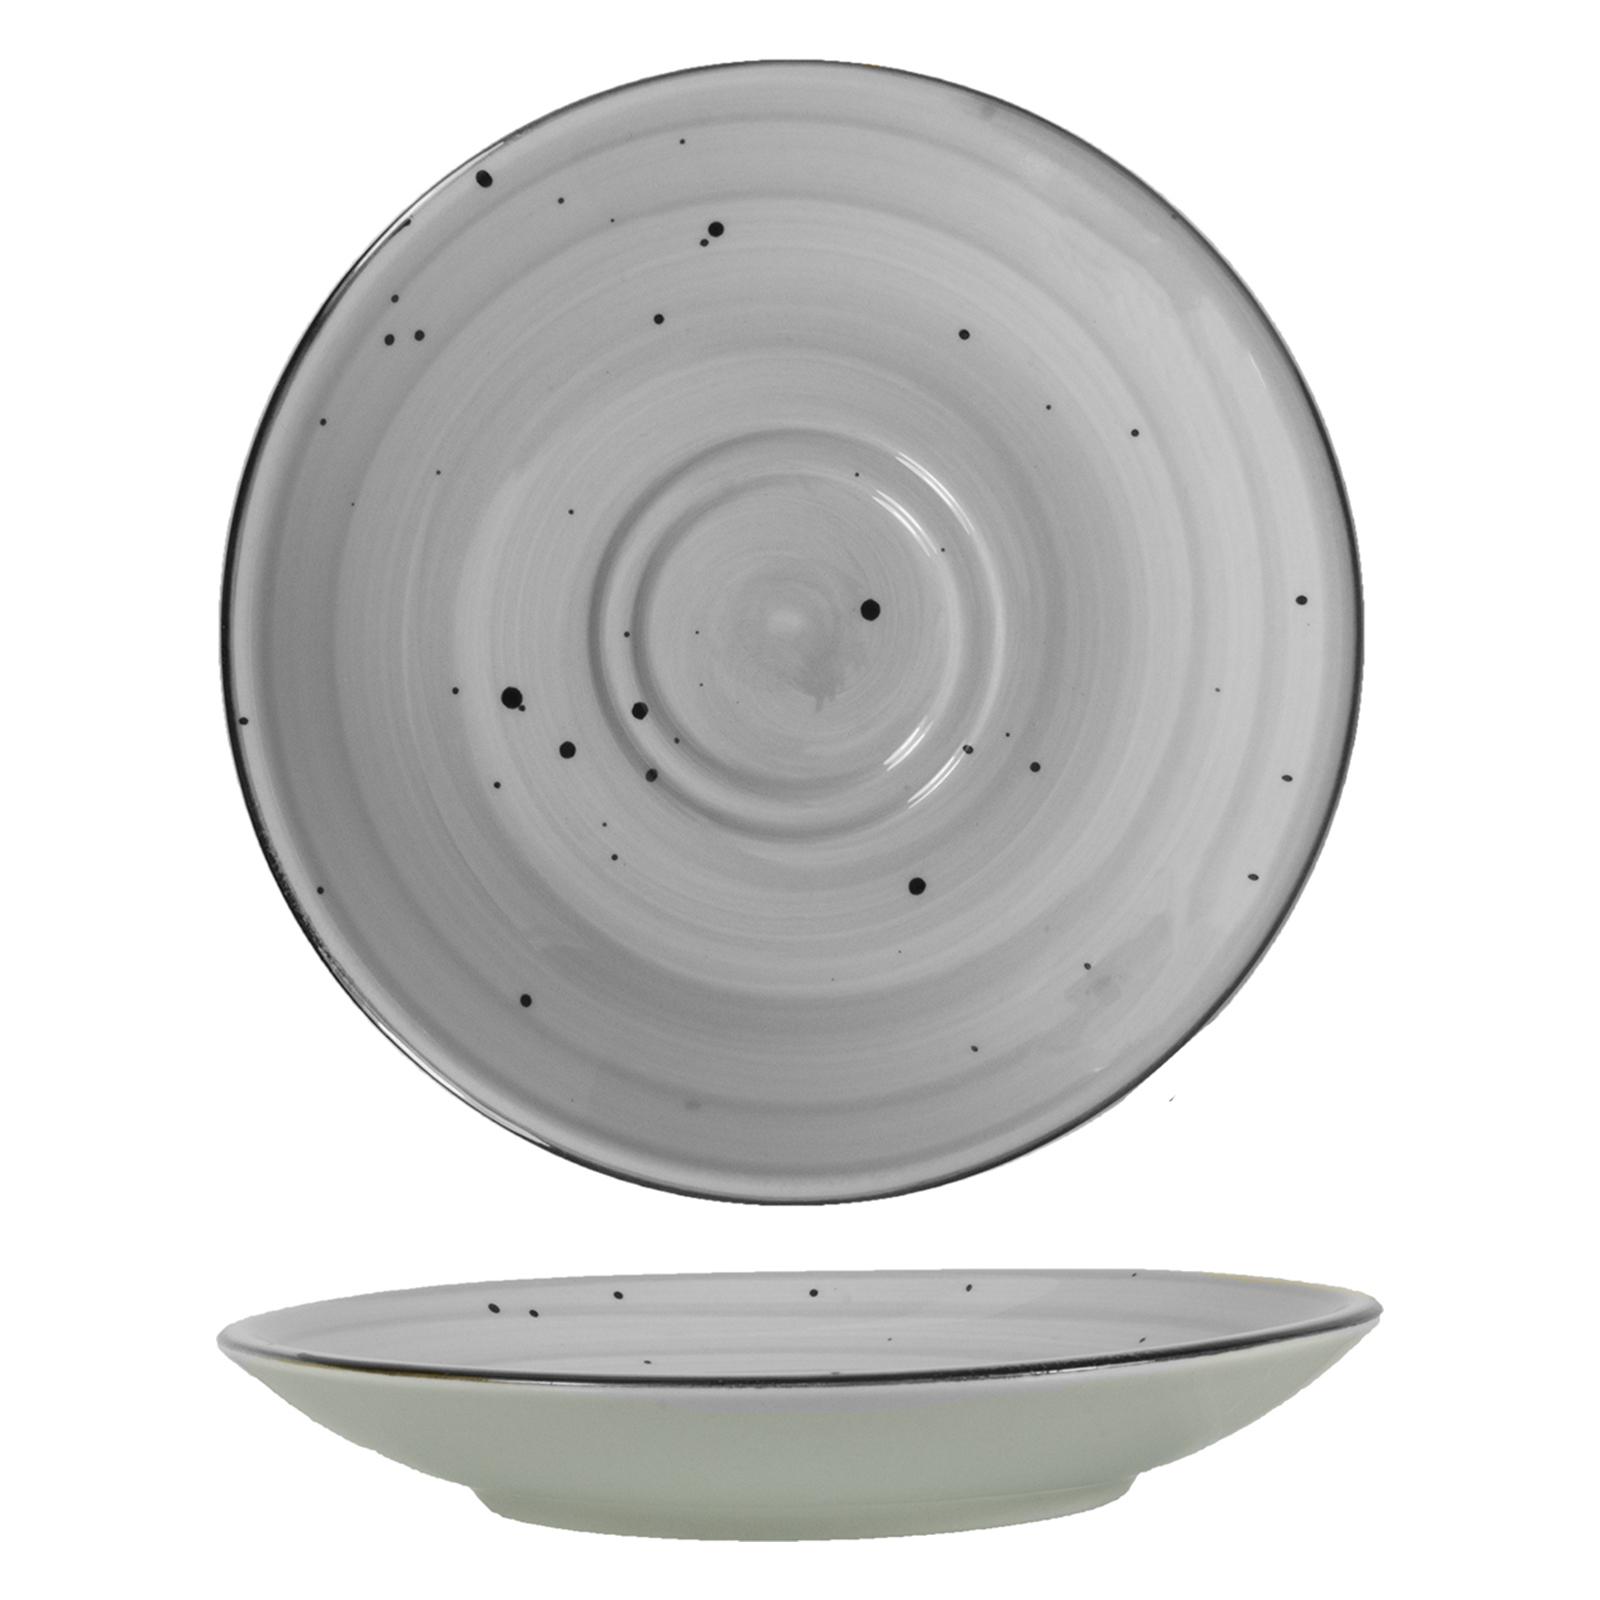 International Tableware RT-2-ST saucer, china